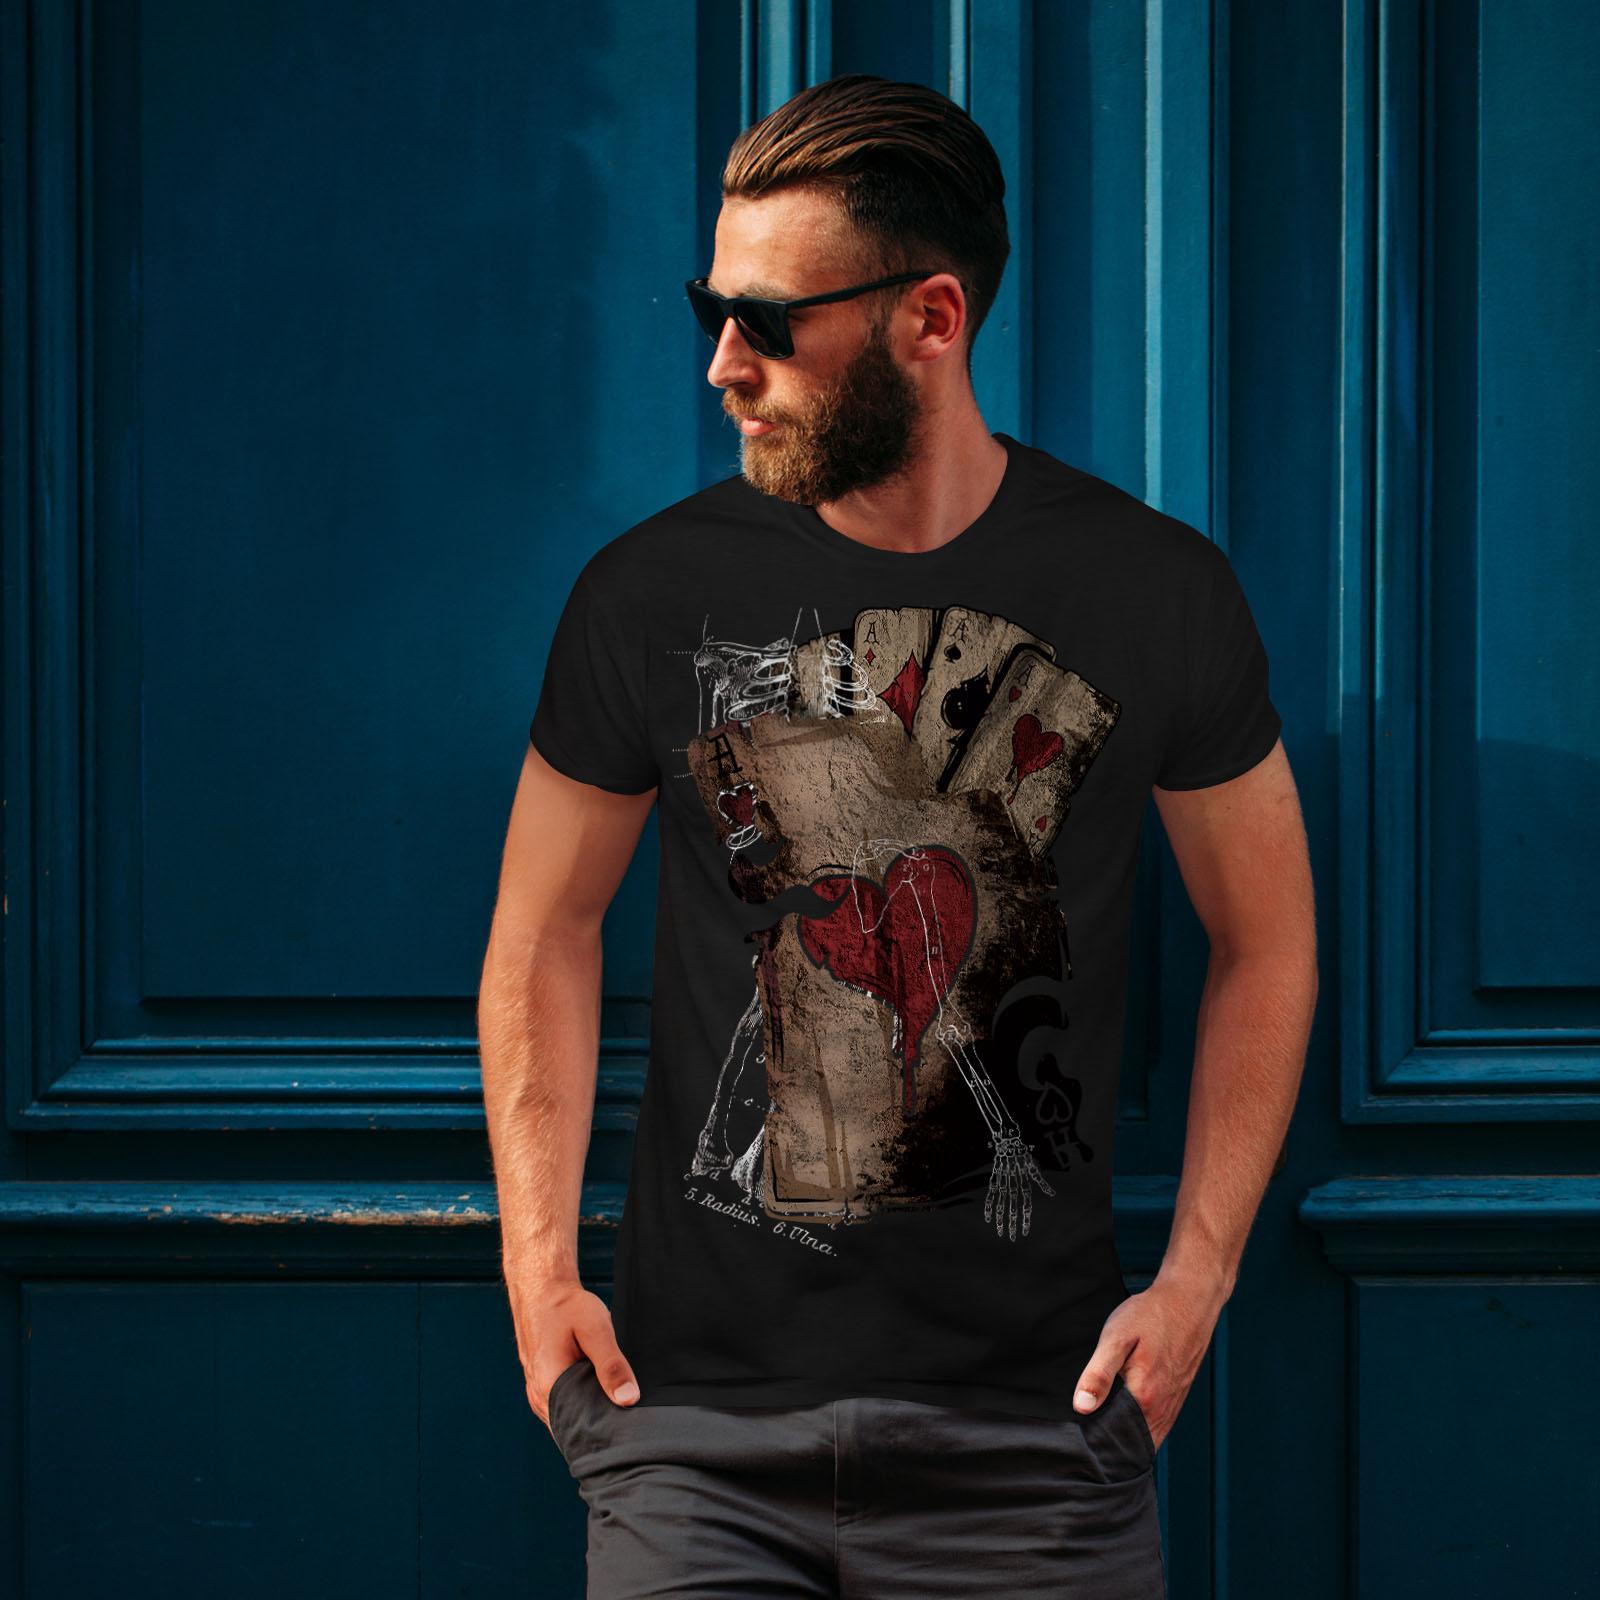 Wellcoda-Poker-Gamble-Squelette-T-shirt-homme-effrayant-conception-graphique-imprime-Tee miniature 4